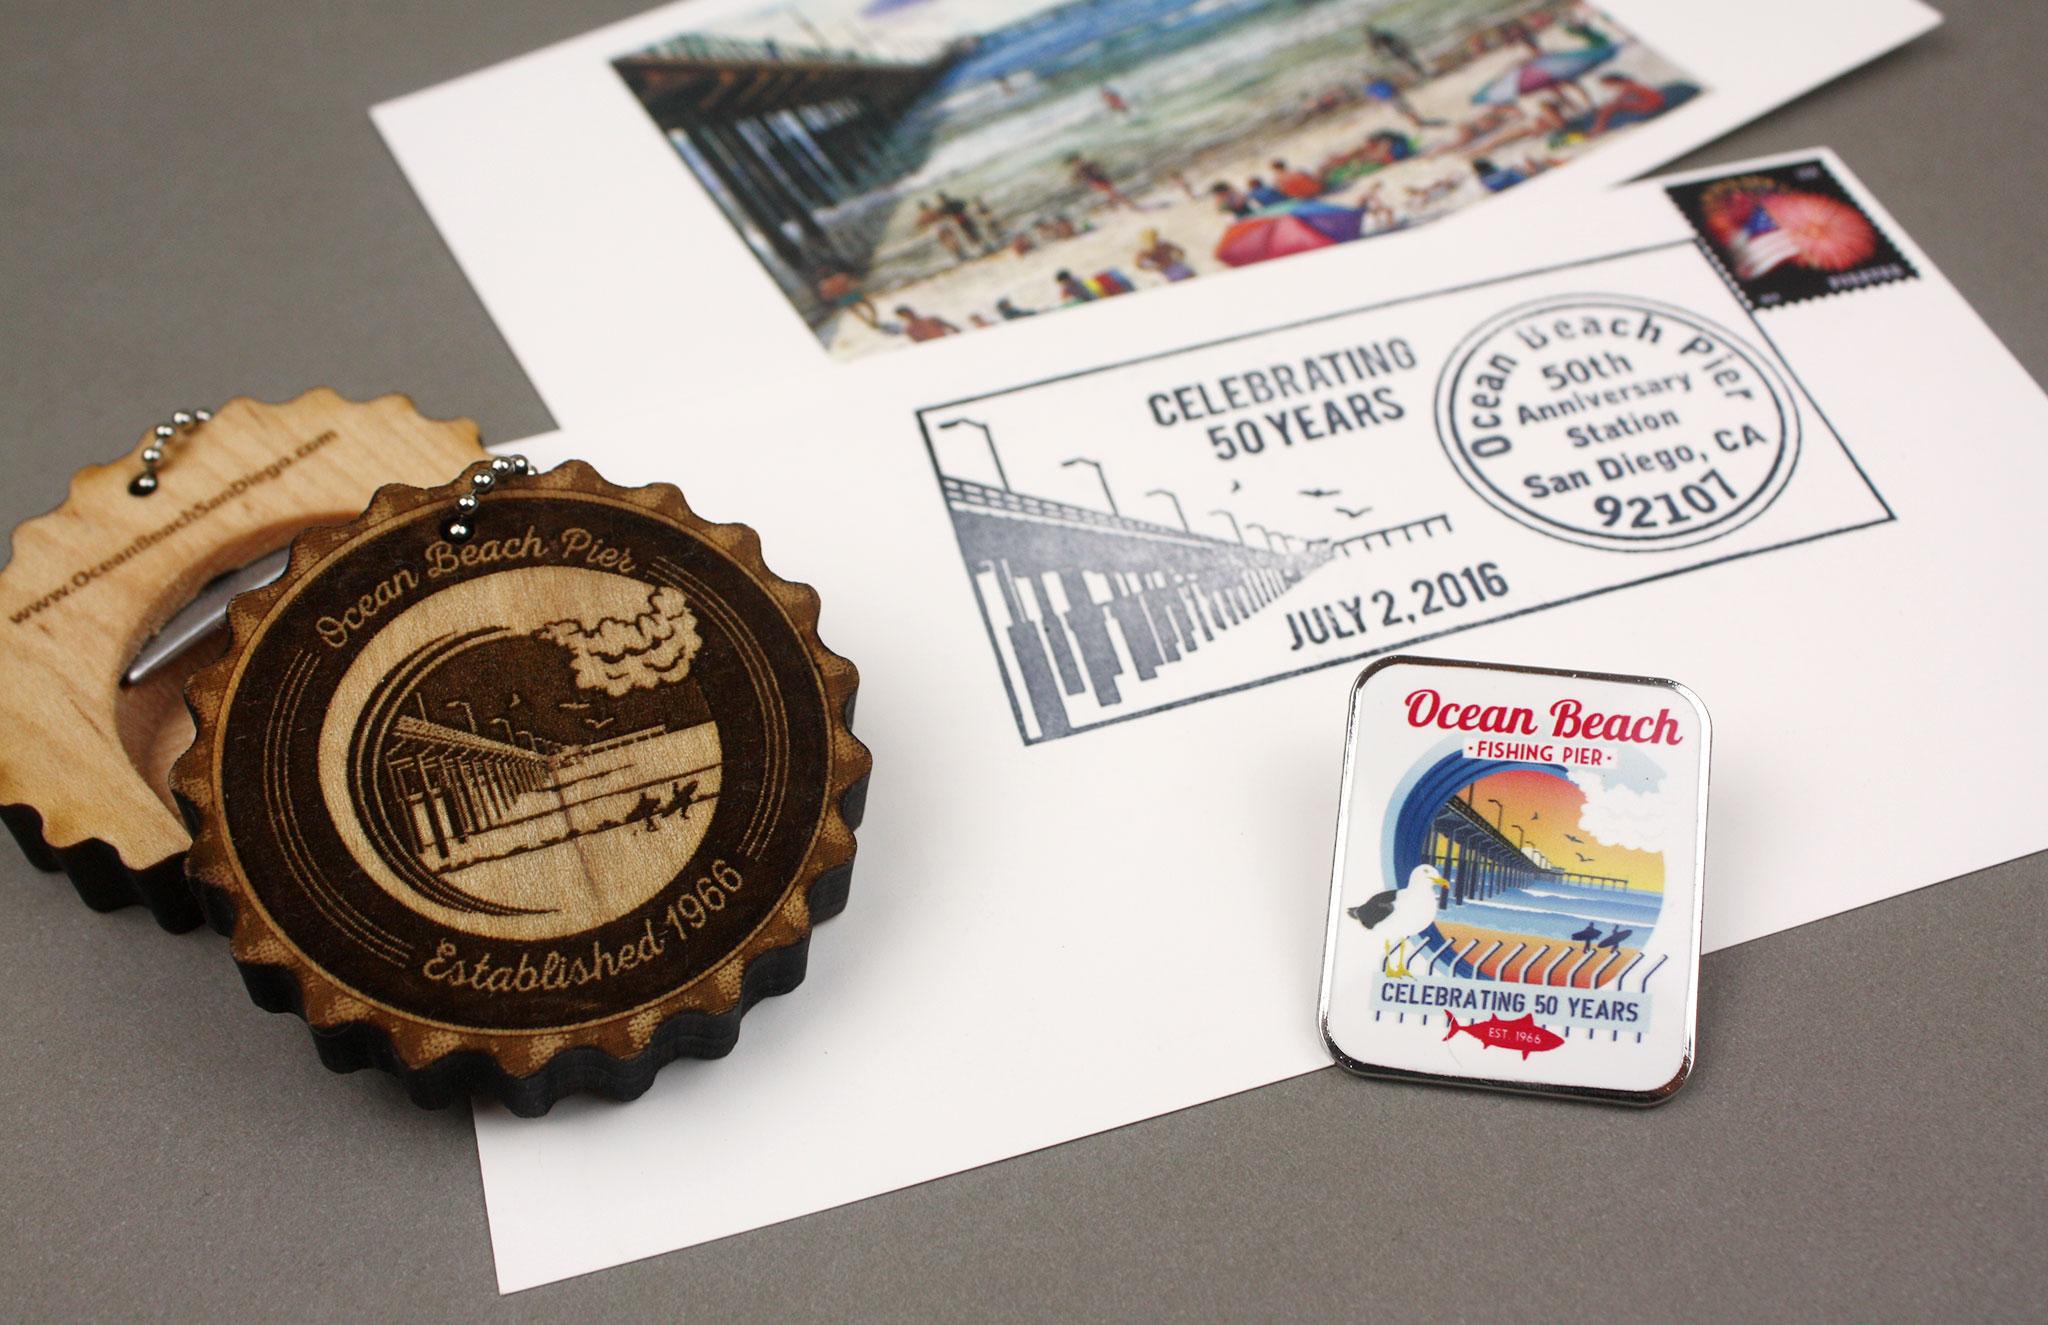 OB Pier 50th Anniversary merchandise and postmark